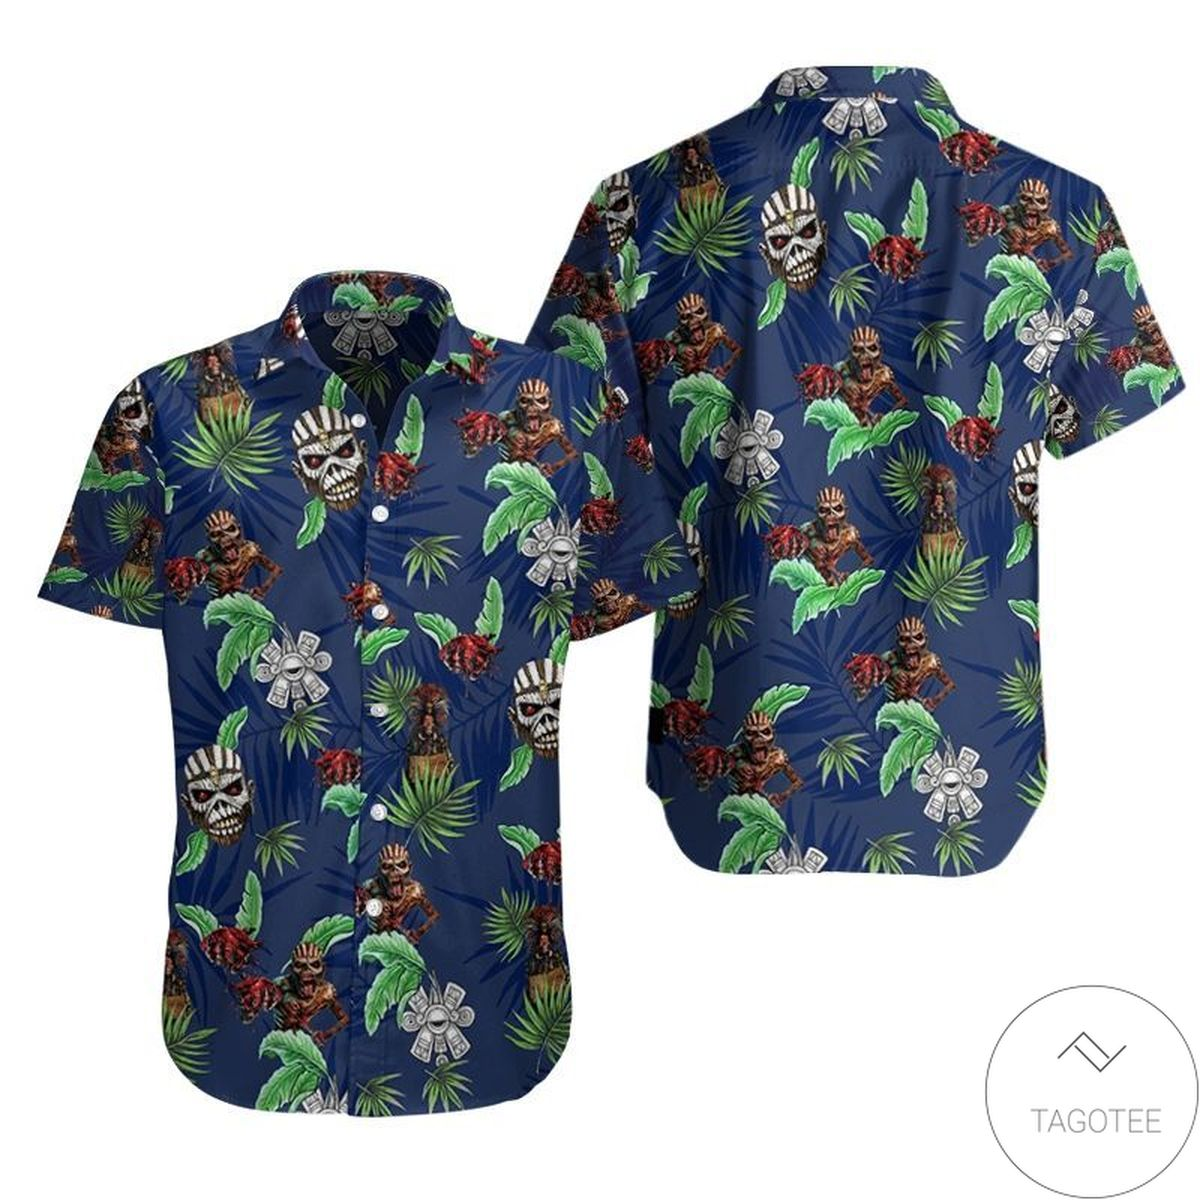 Iron Maiden Band Hawaiian Shirt